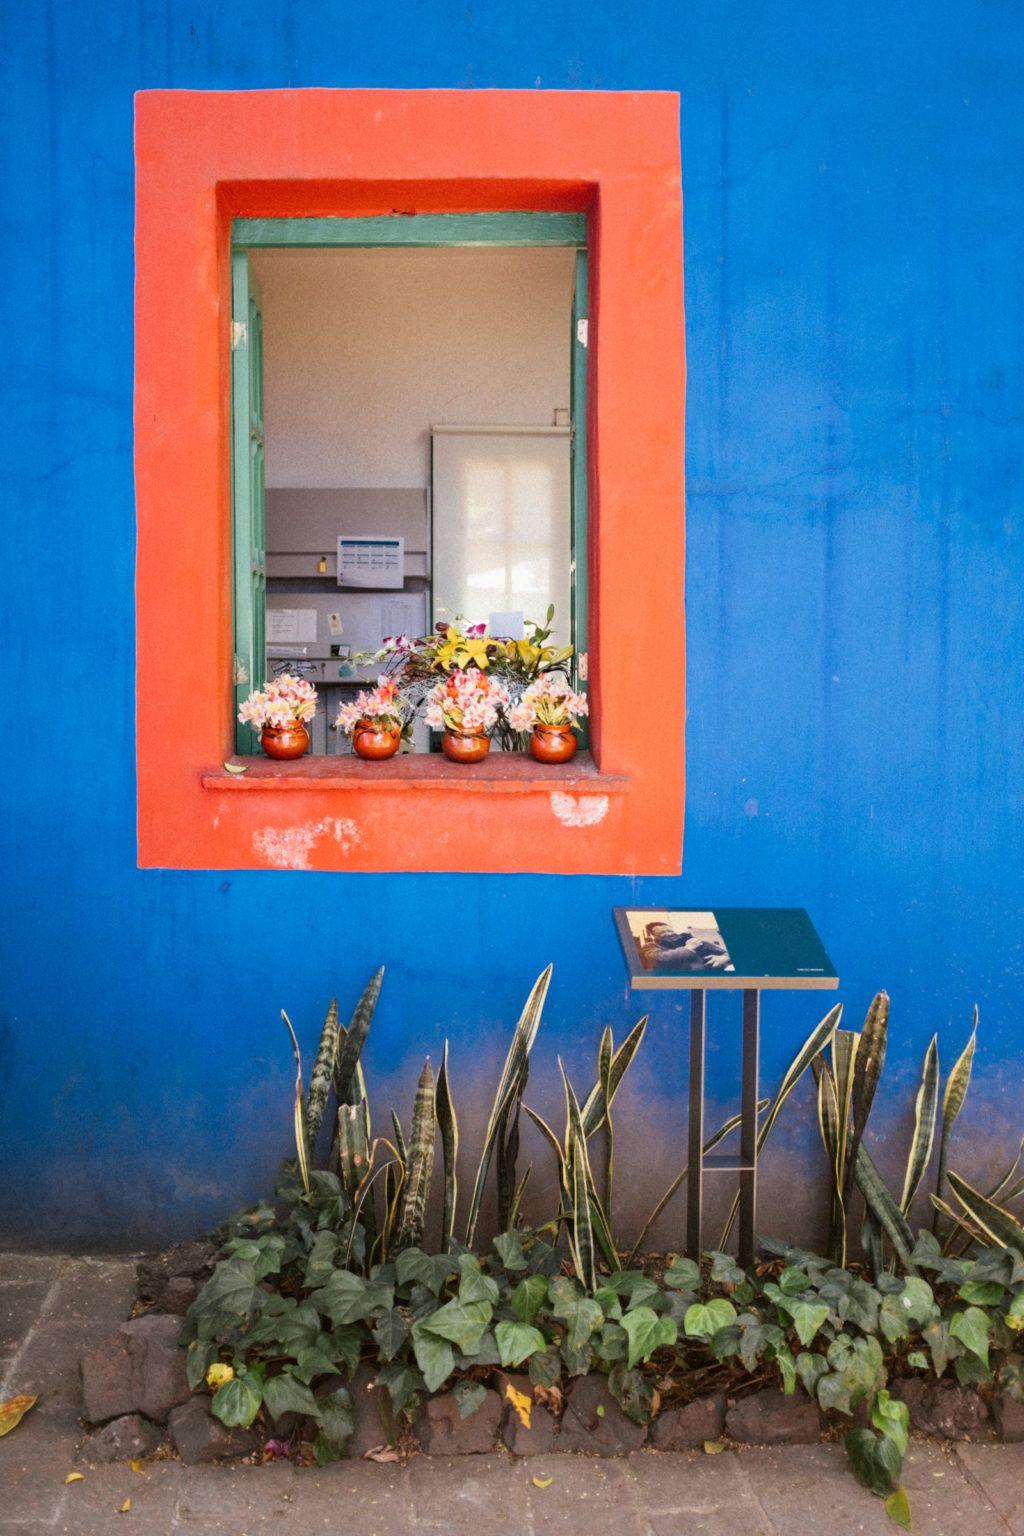 Museo Frida Kahlo La Casa Azul The Blue House In Mexico City Frida Kahlo House Color Palettes Blue House